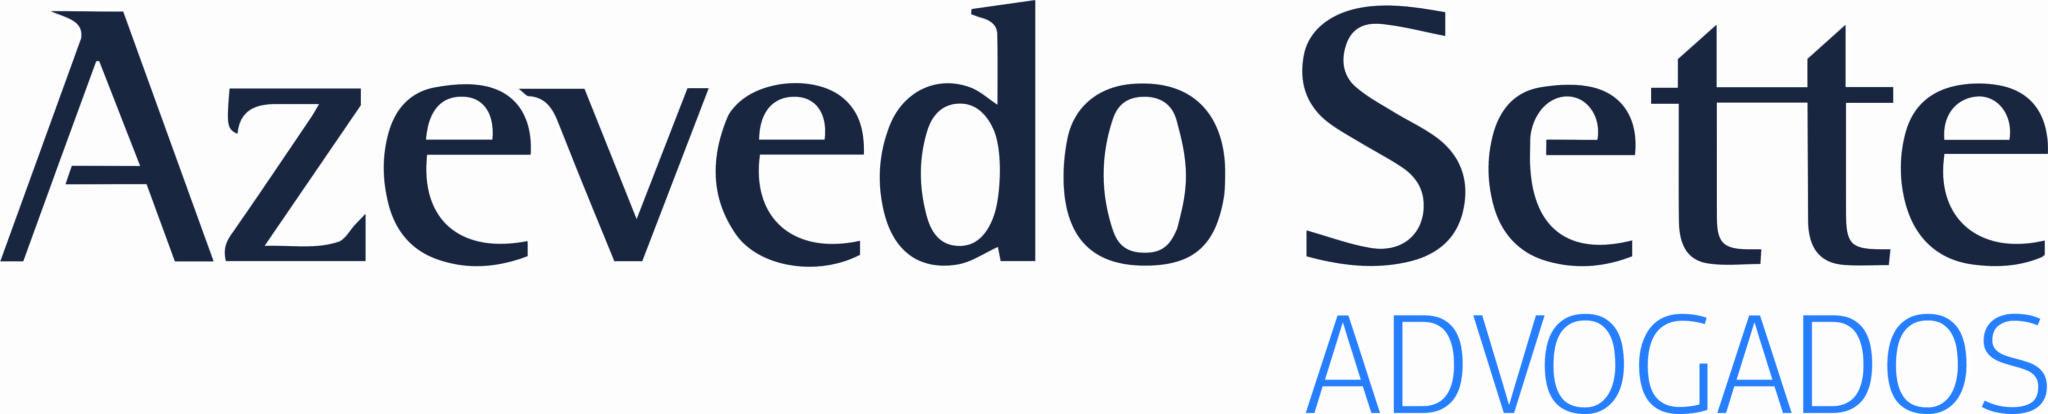 azevedo sette logo